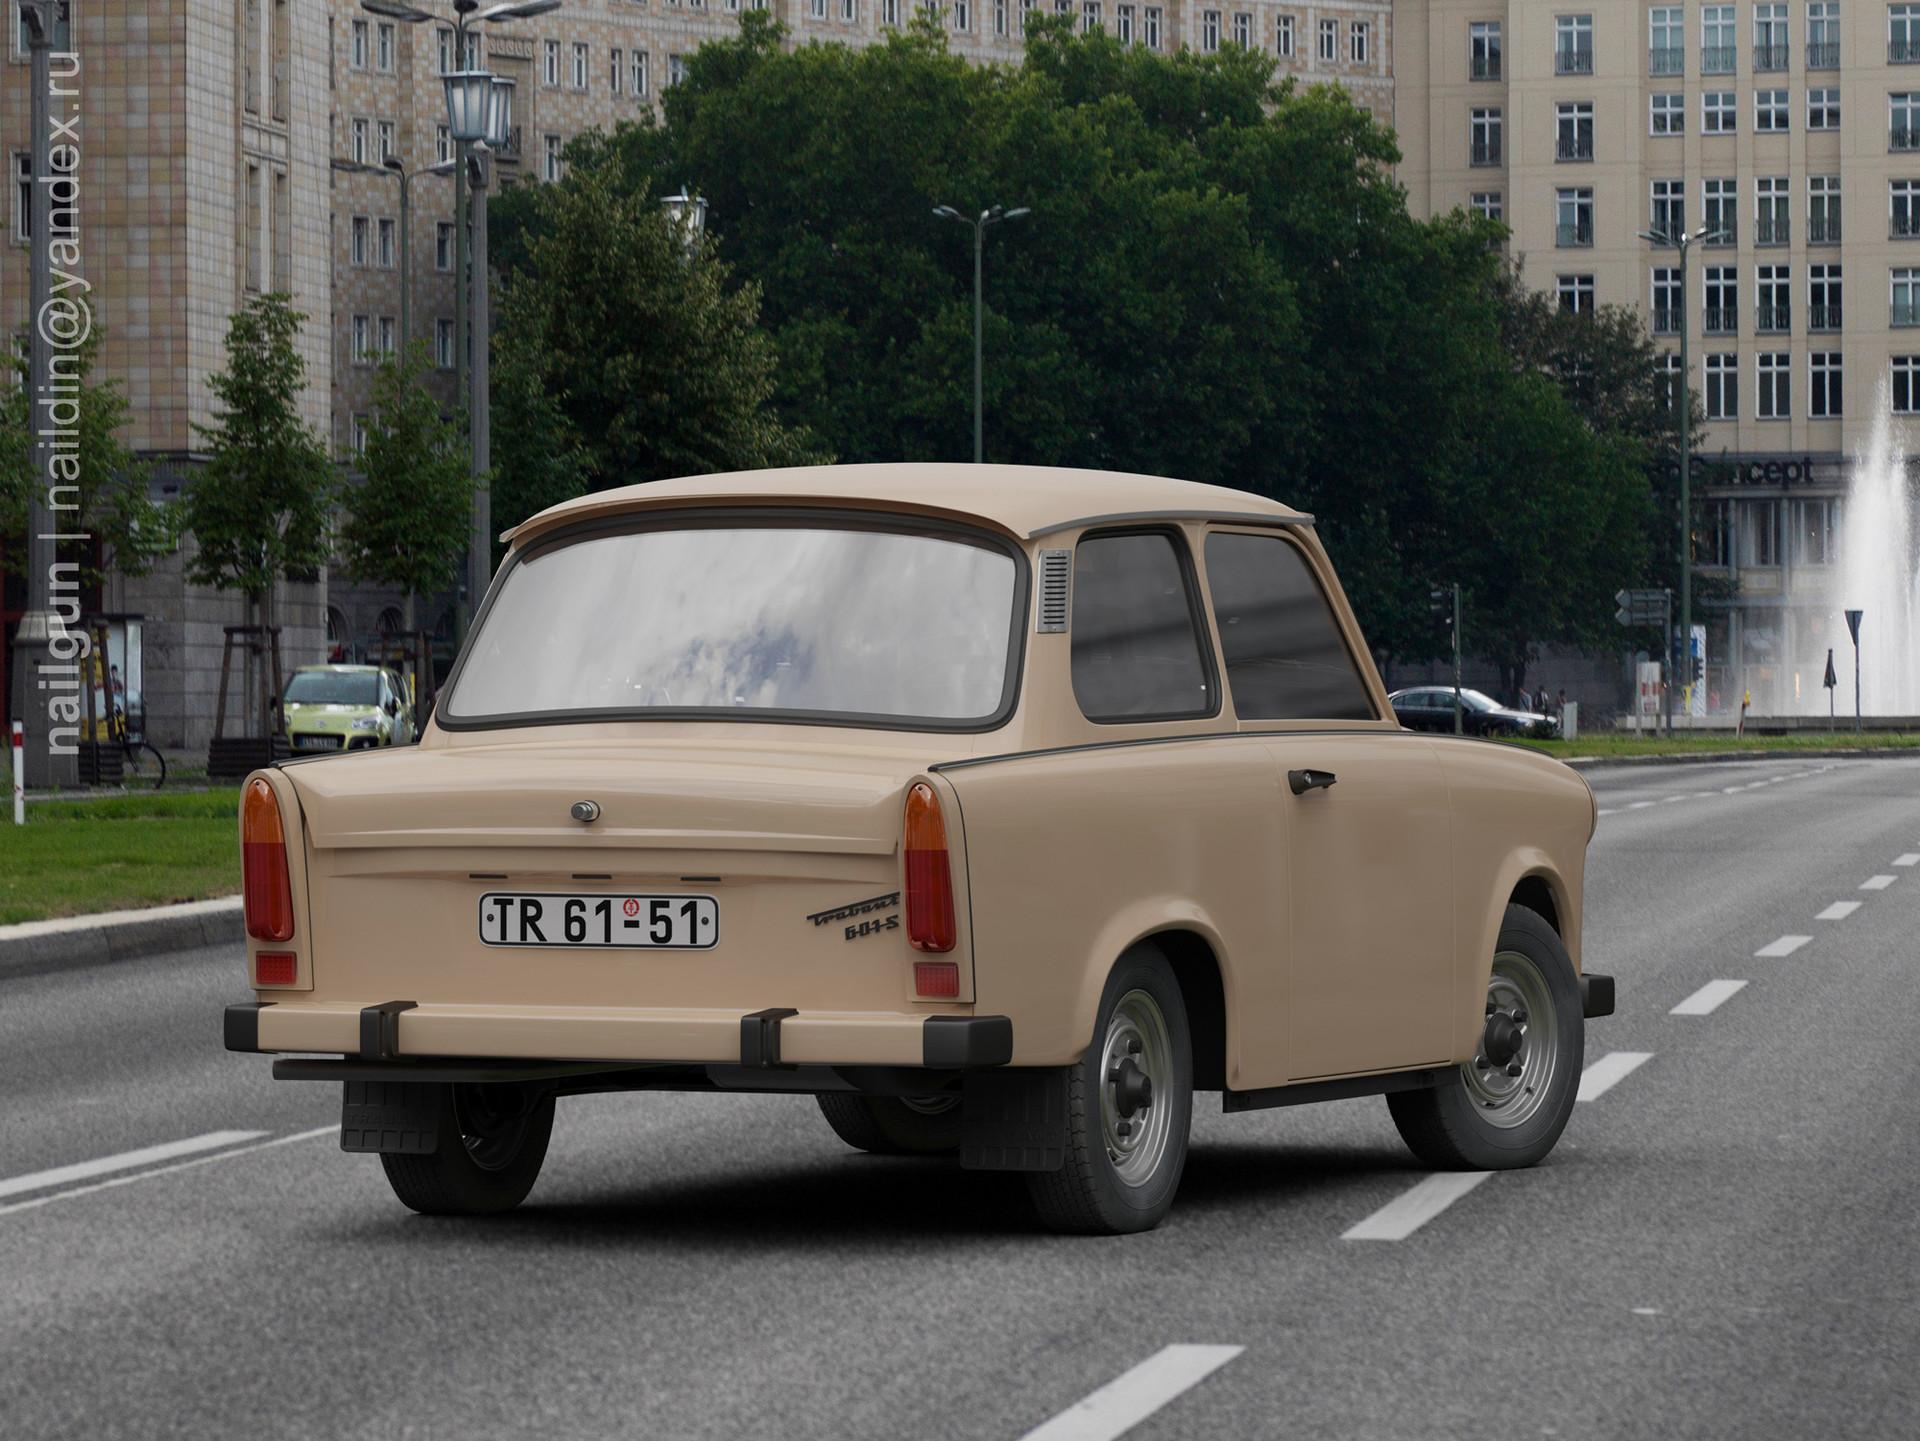 Nail khusnutdinov als 151 010 trabant limo back view 3x